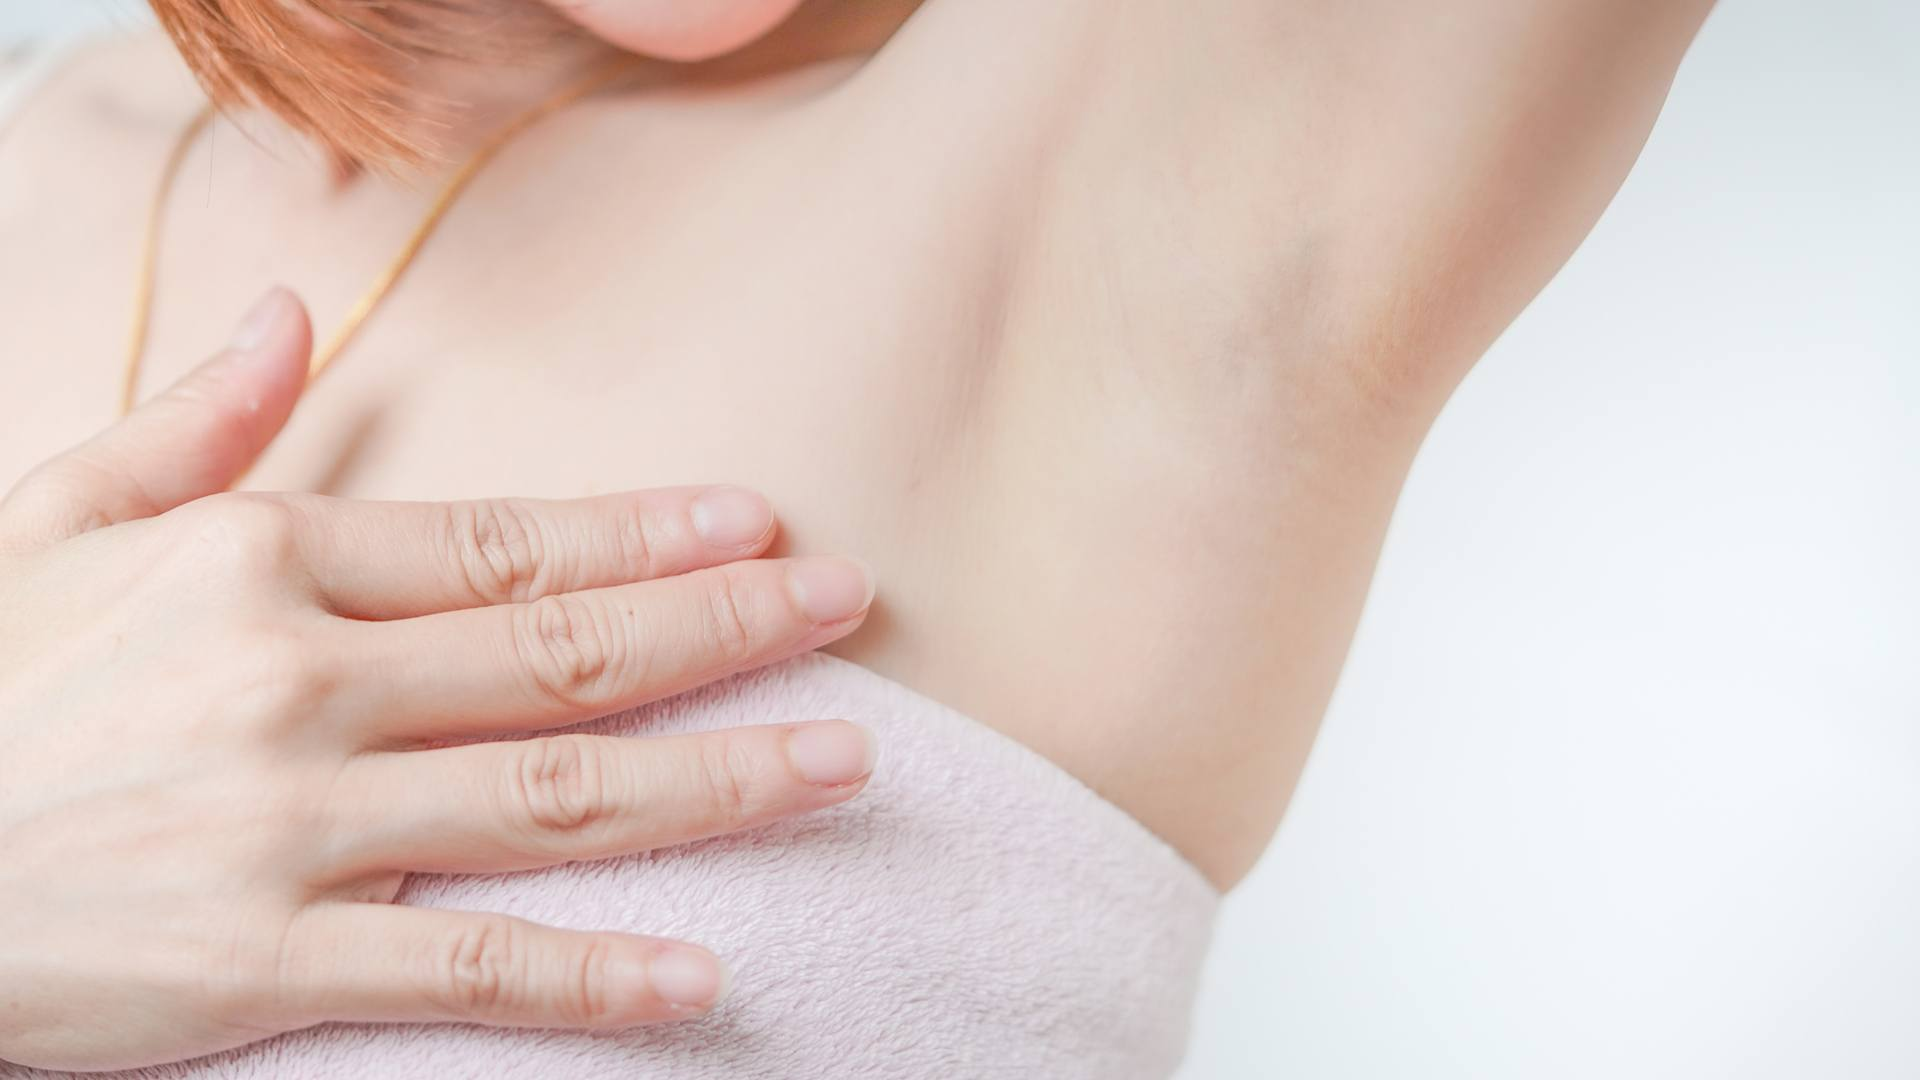 3. Dead skin buildup can cause discolored armpits